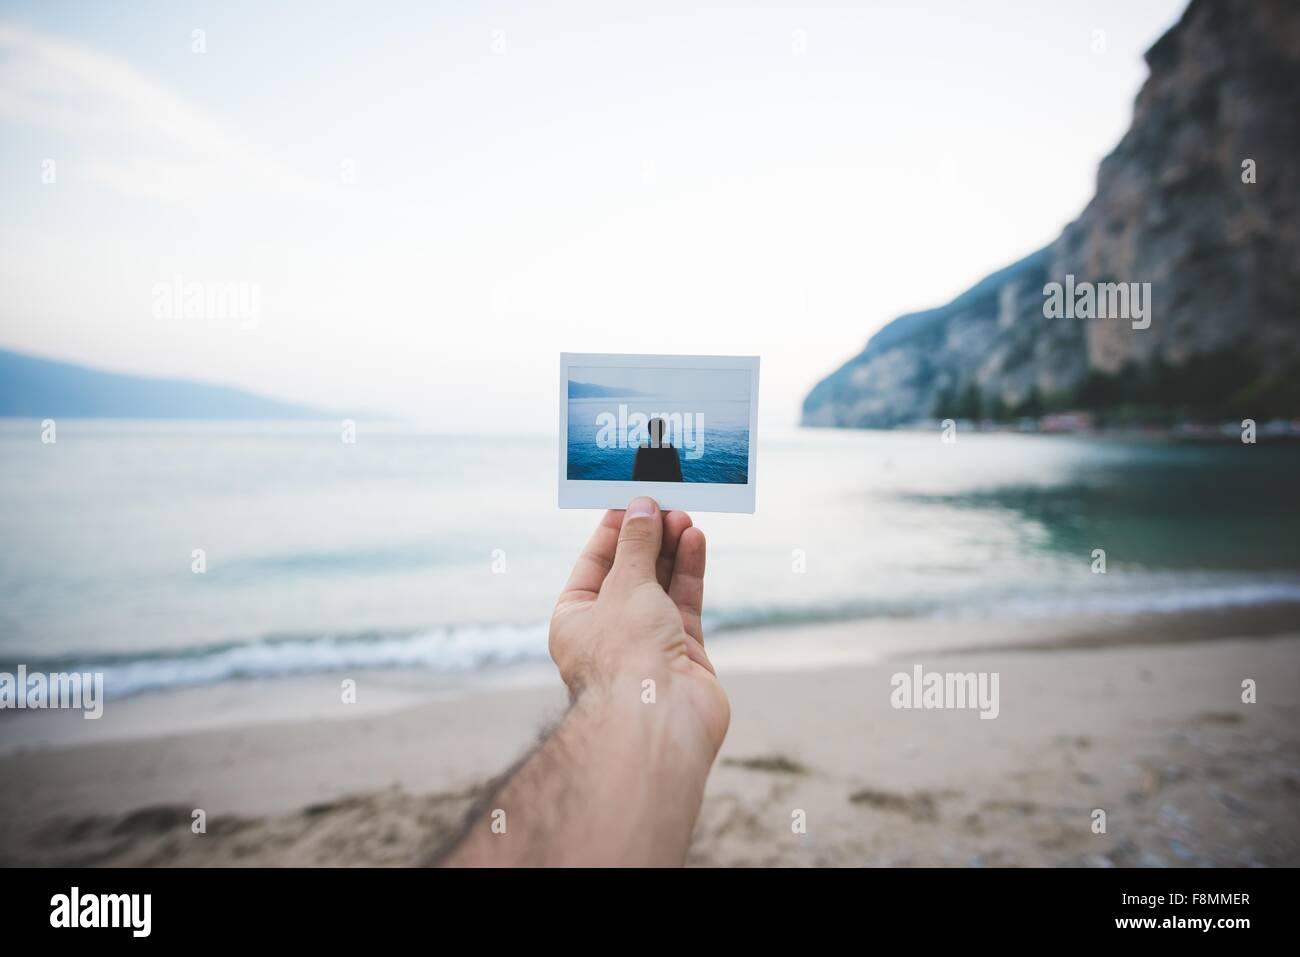 Person holding up photograph, Lake Garda, Italy - Stock Image